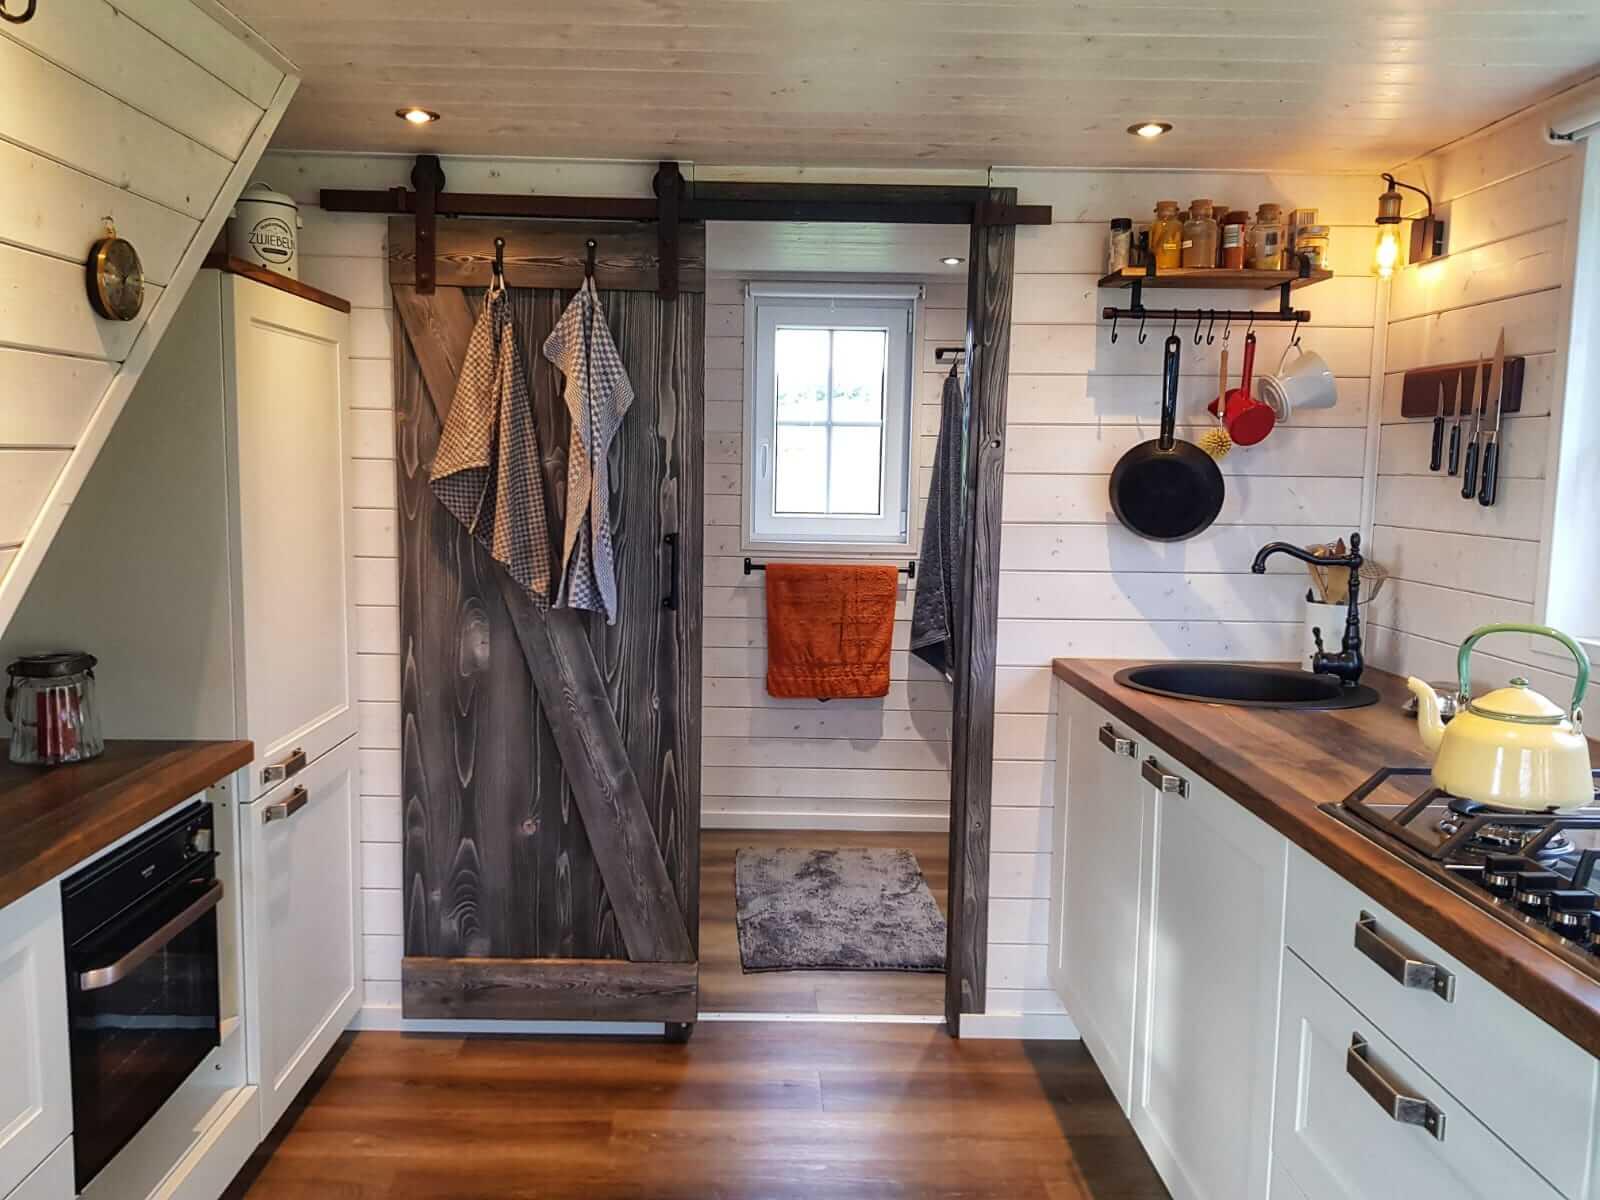 mobiles-tiny-house-lappland-vital-camp-gmbh-16